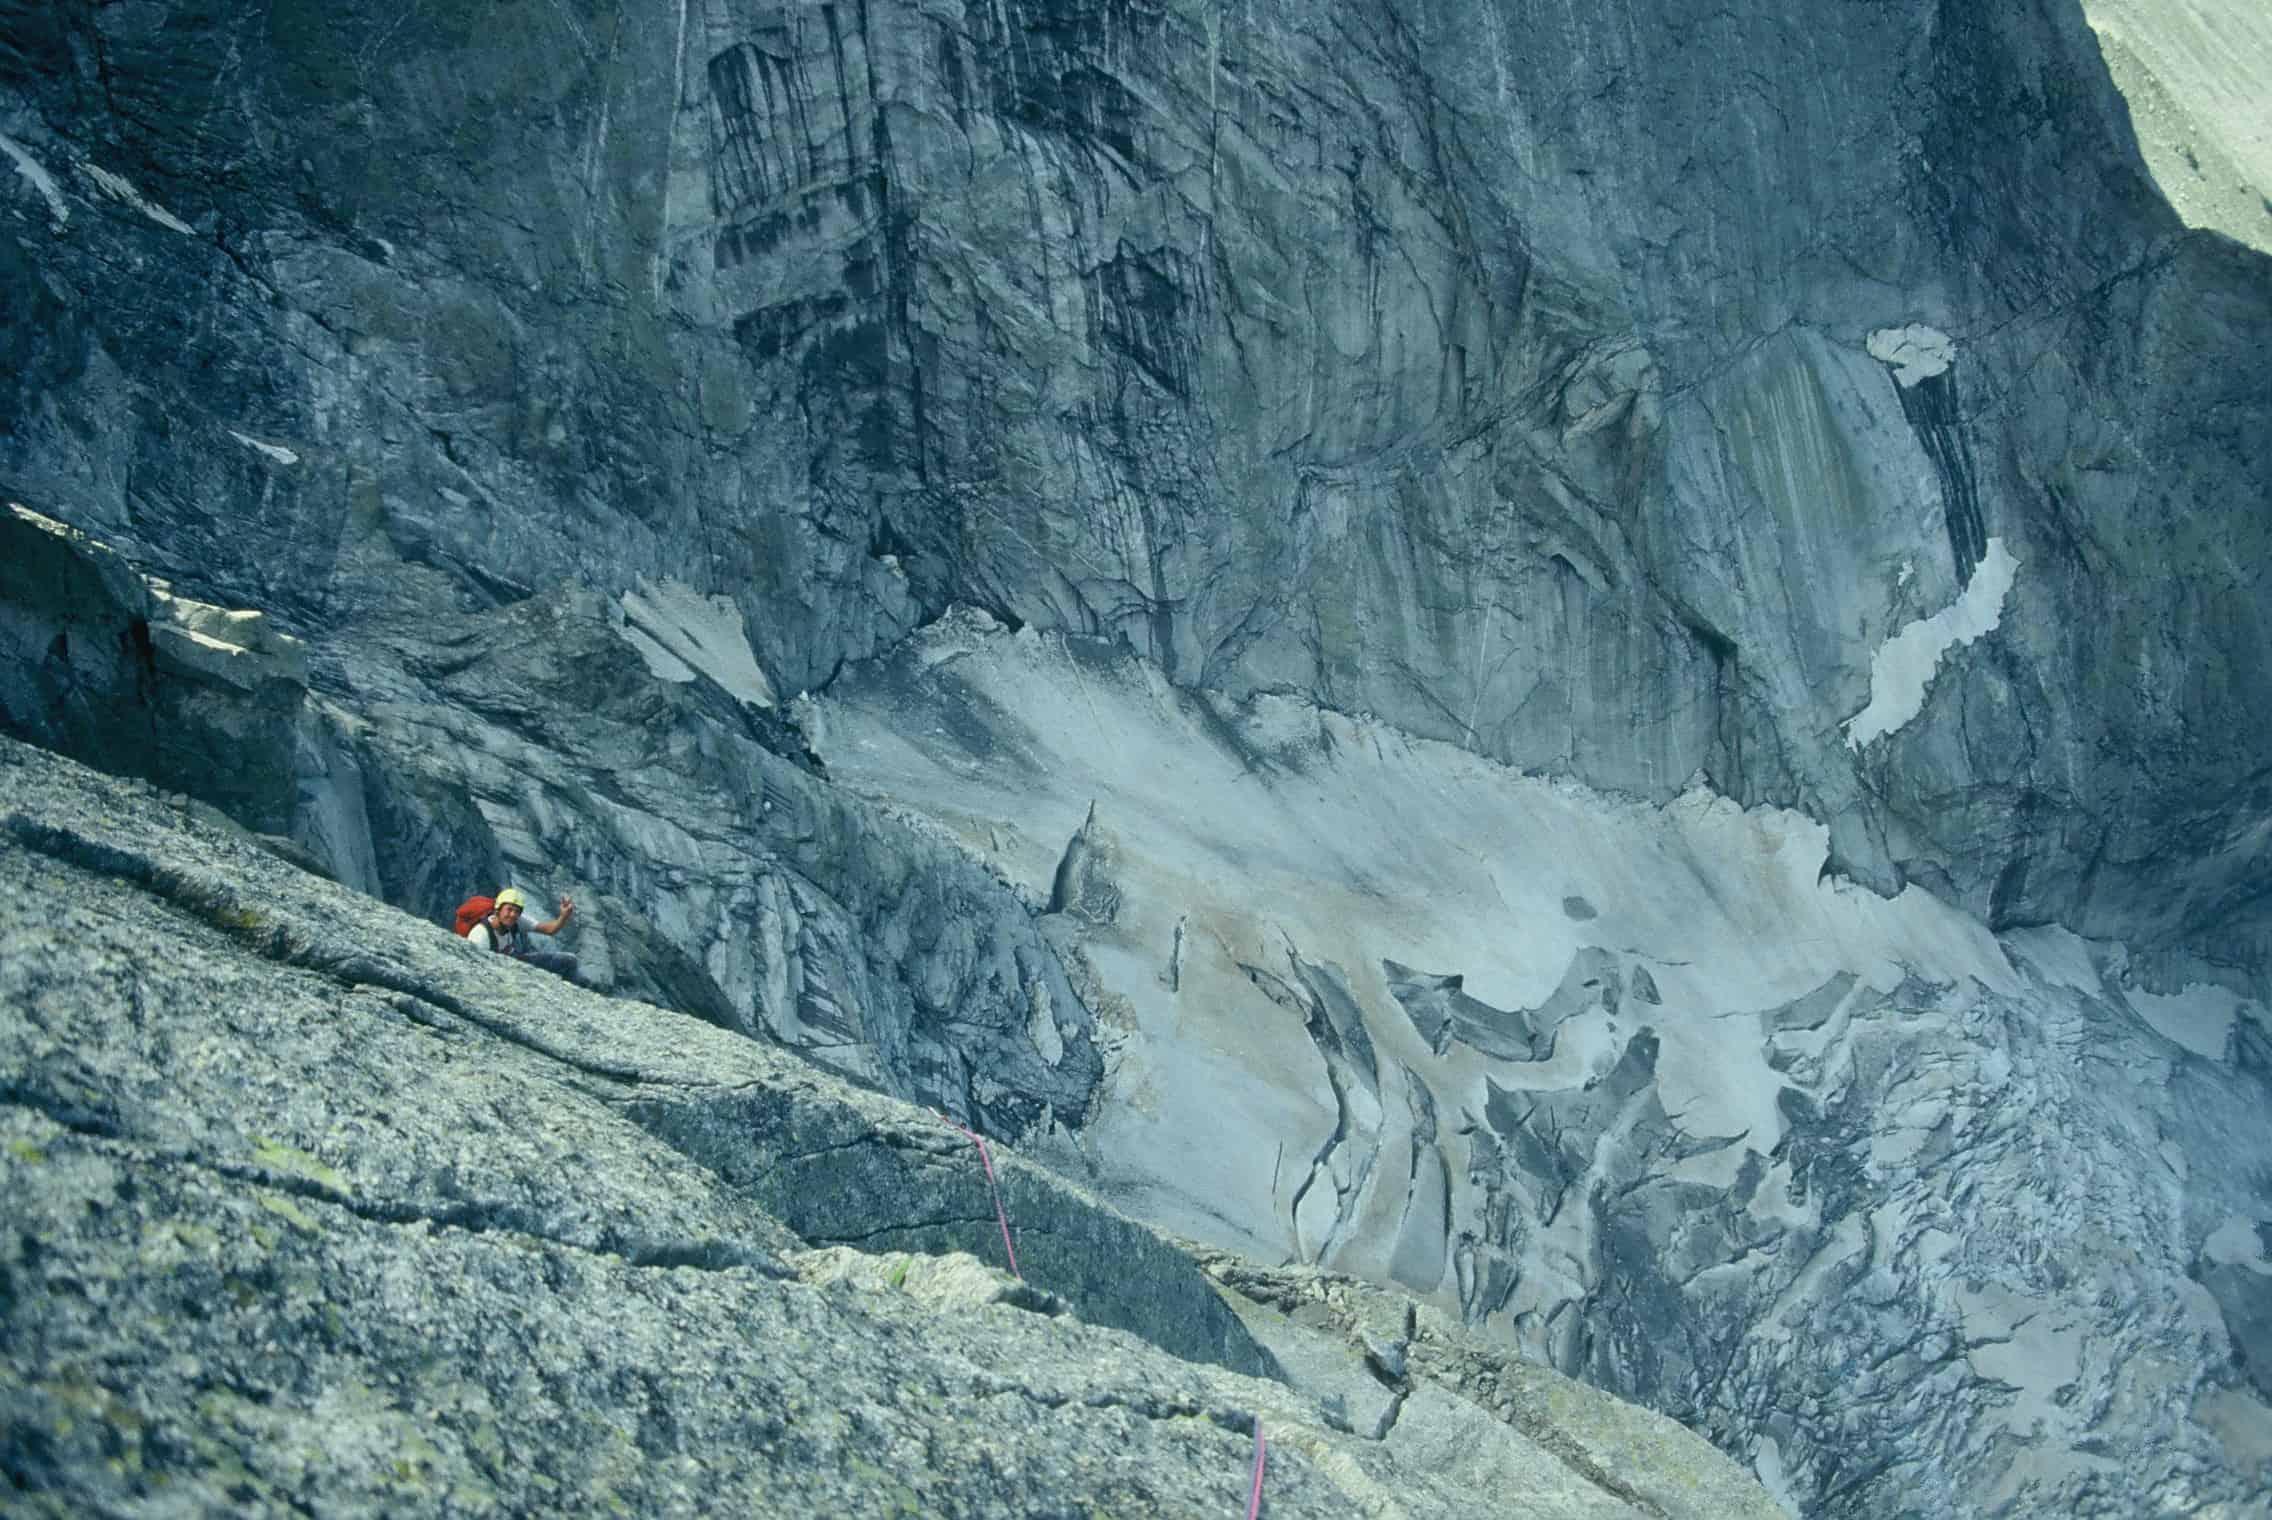 Bergsturz am Piz Cengalo